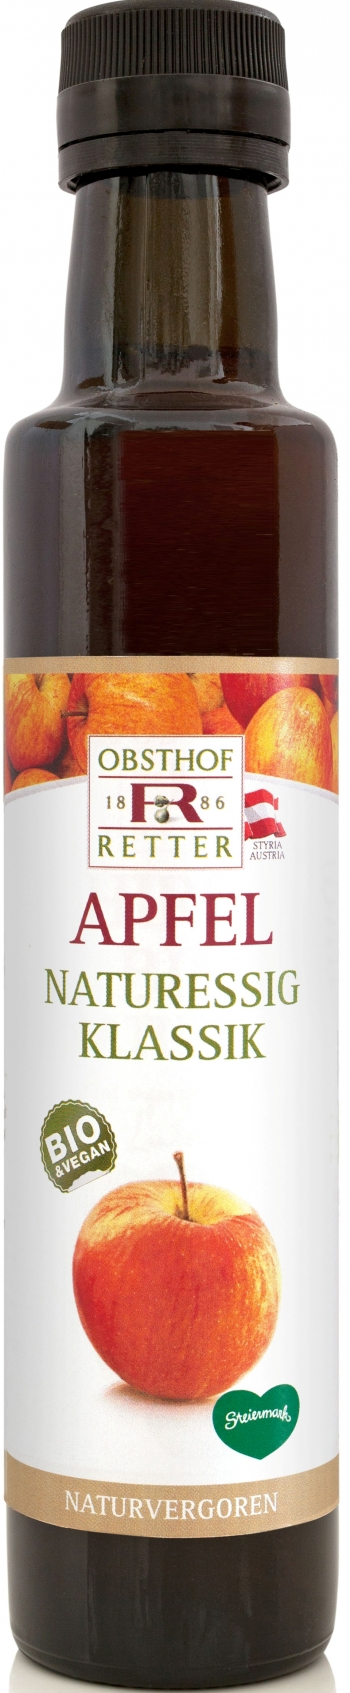 Apfel Naturessig Bio, 250ml, Retter